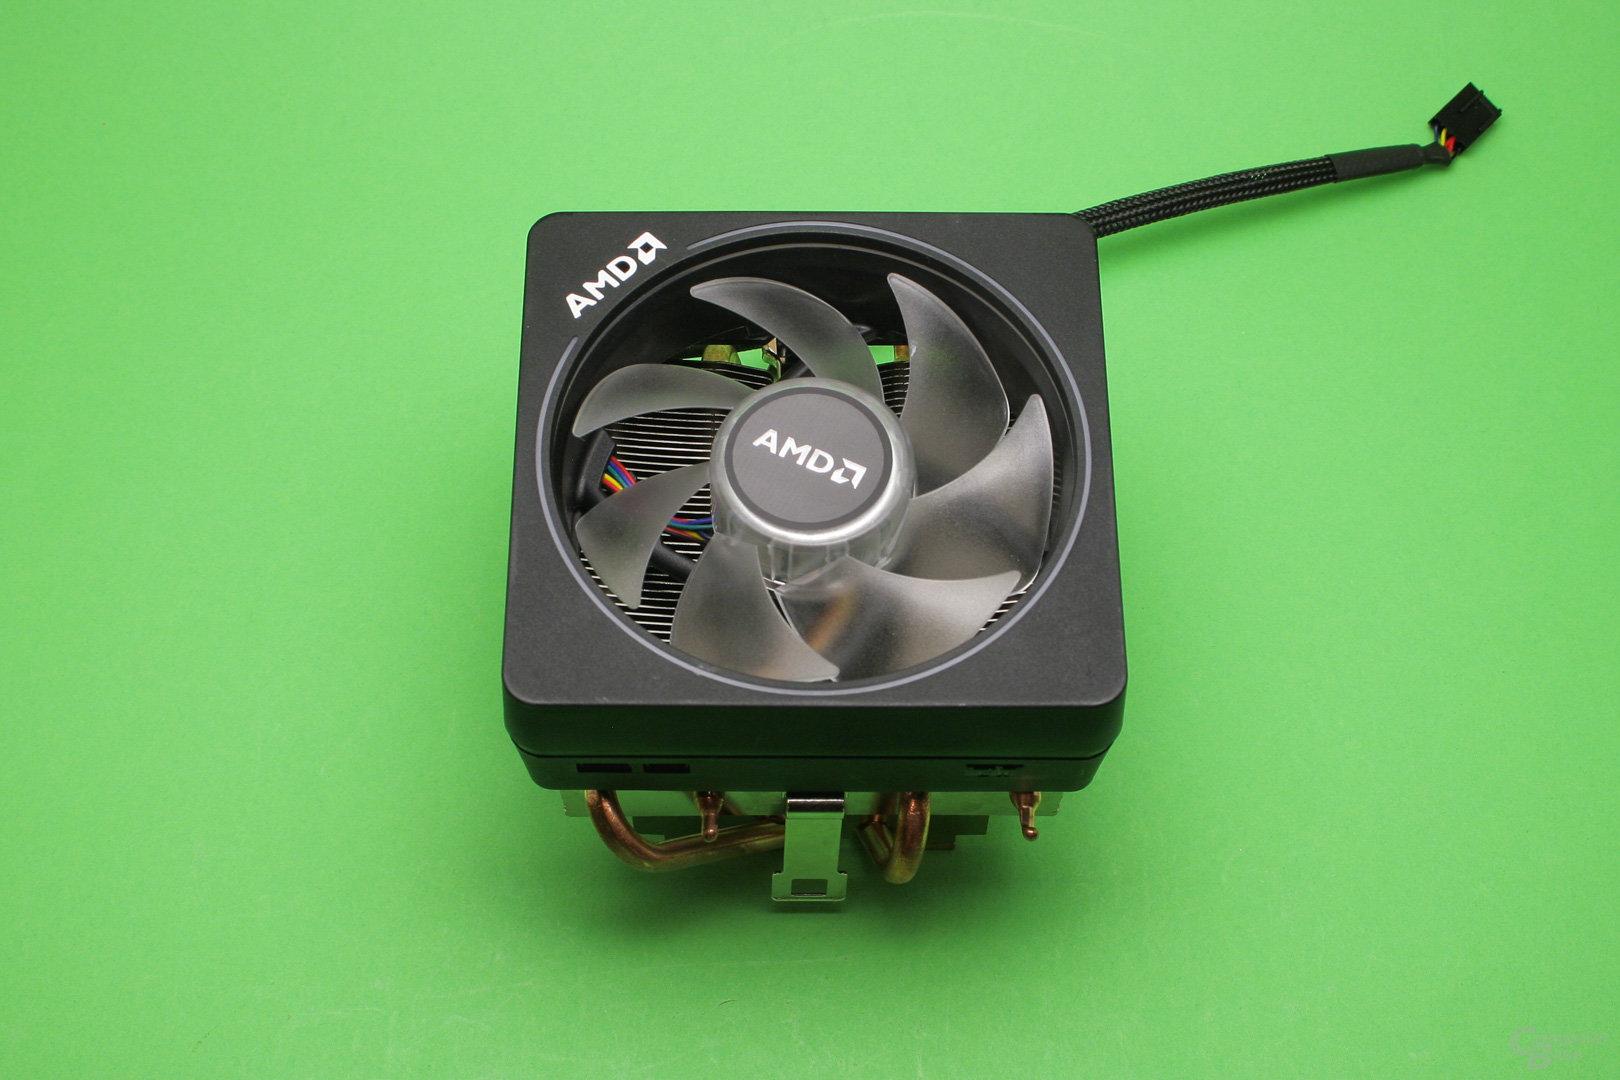 AMD Wraith Prism: Top-Blow-Kühler mit über 9 cm Bauhöhe